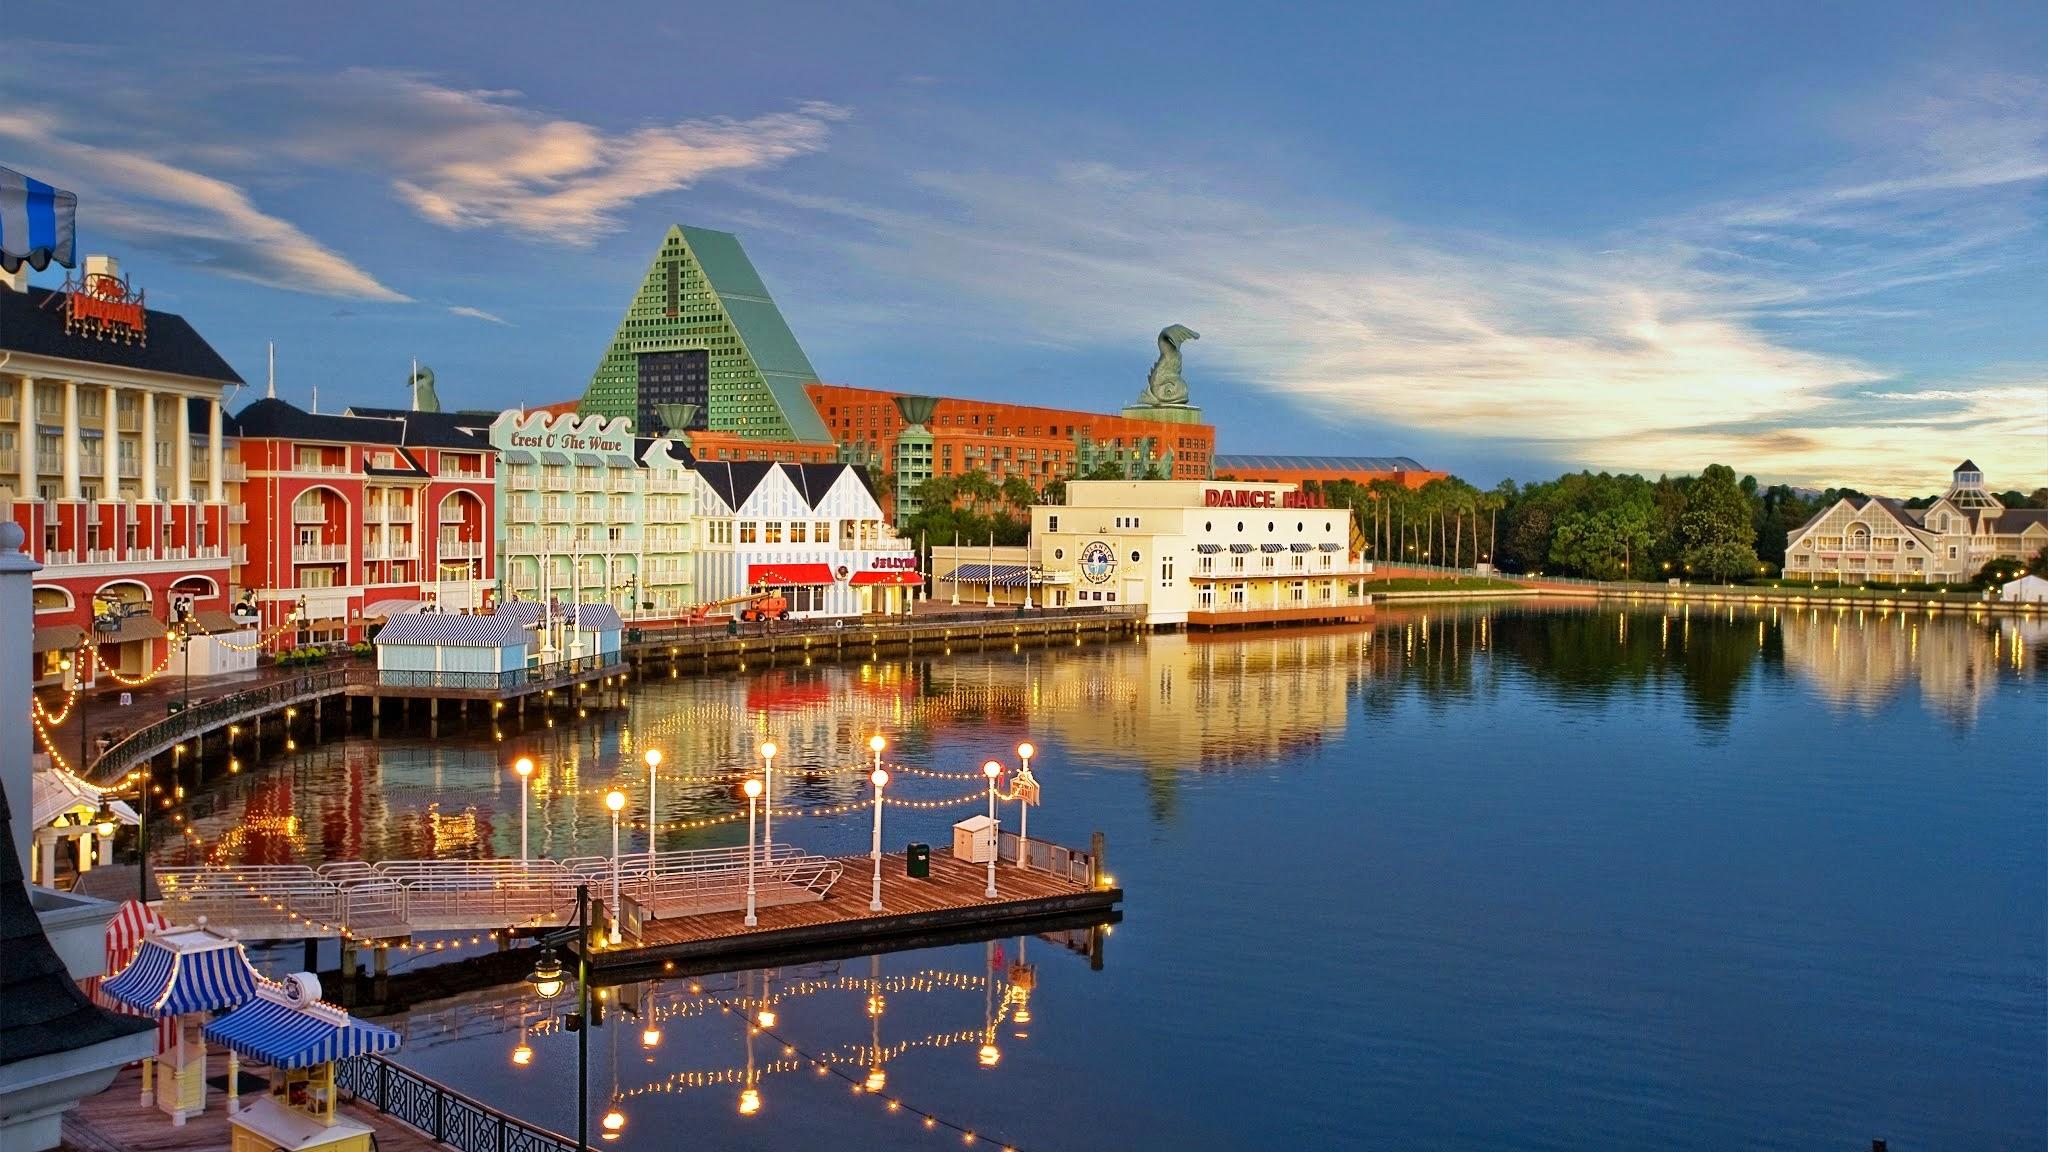 Disney's BoardWalk Villas image 1